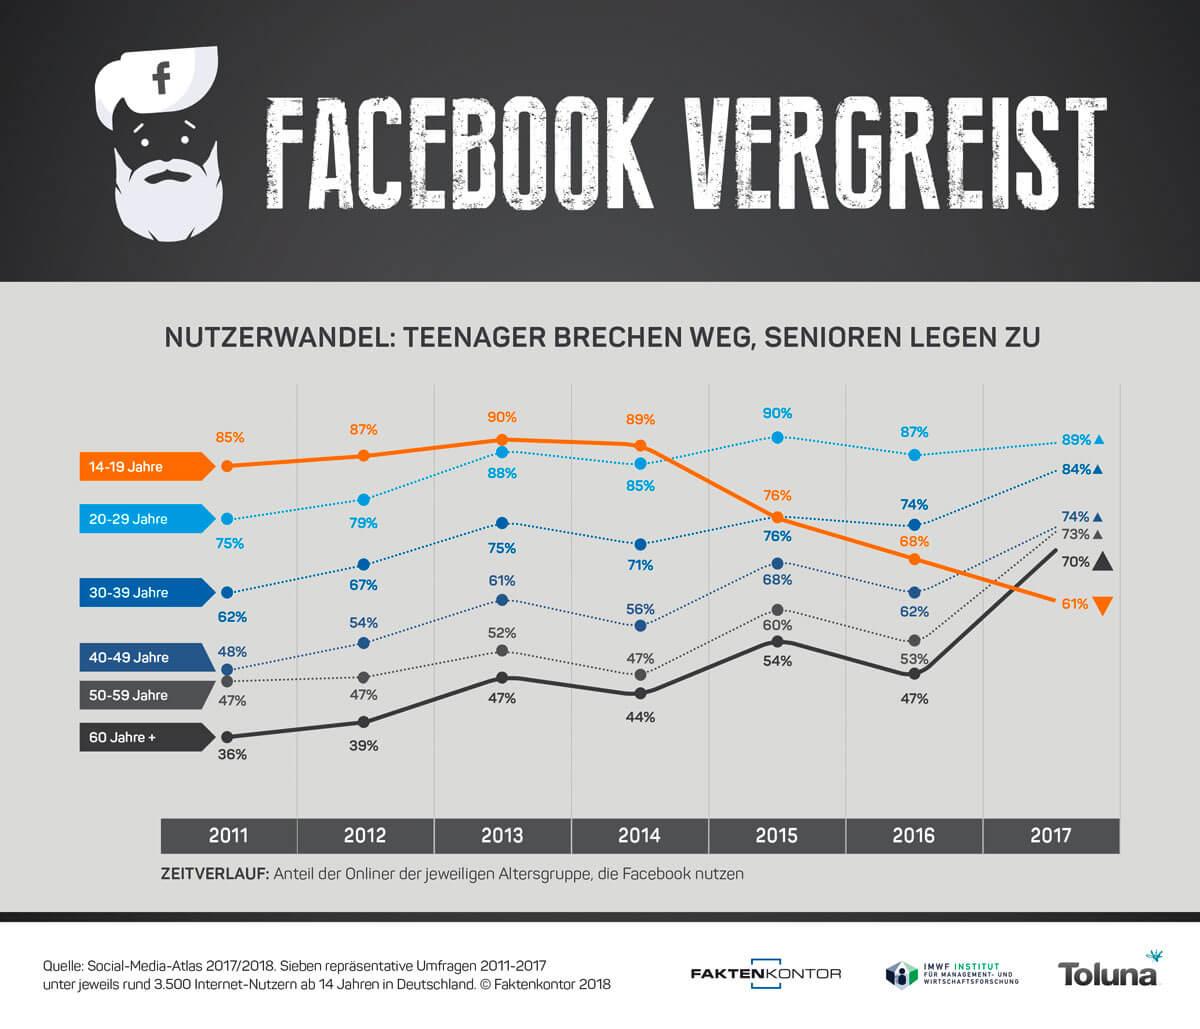 Infografik Facebook-Nutzerwandel Altersgruppen 2011-2017 Faktenkontor Social-Media-Atlas 2017-2018 – Marketingkolumnde DER Mittelstand. Ausgabe 3/18